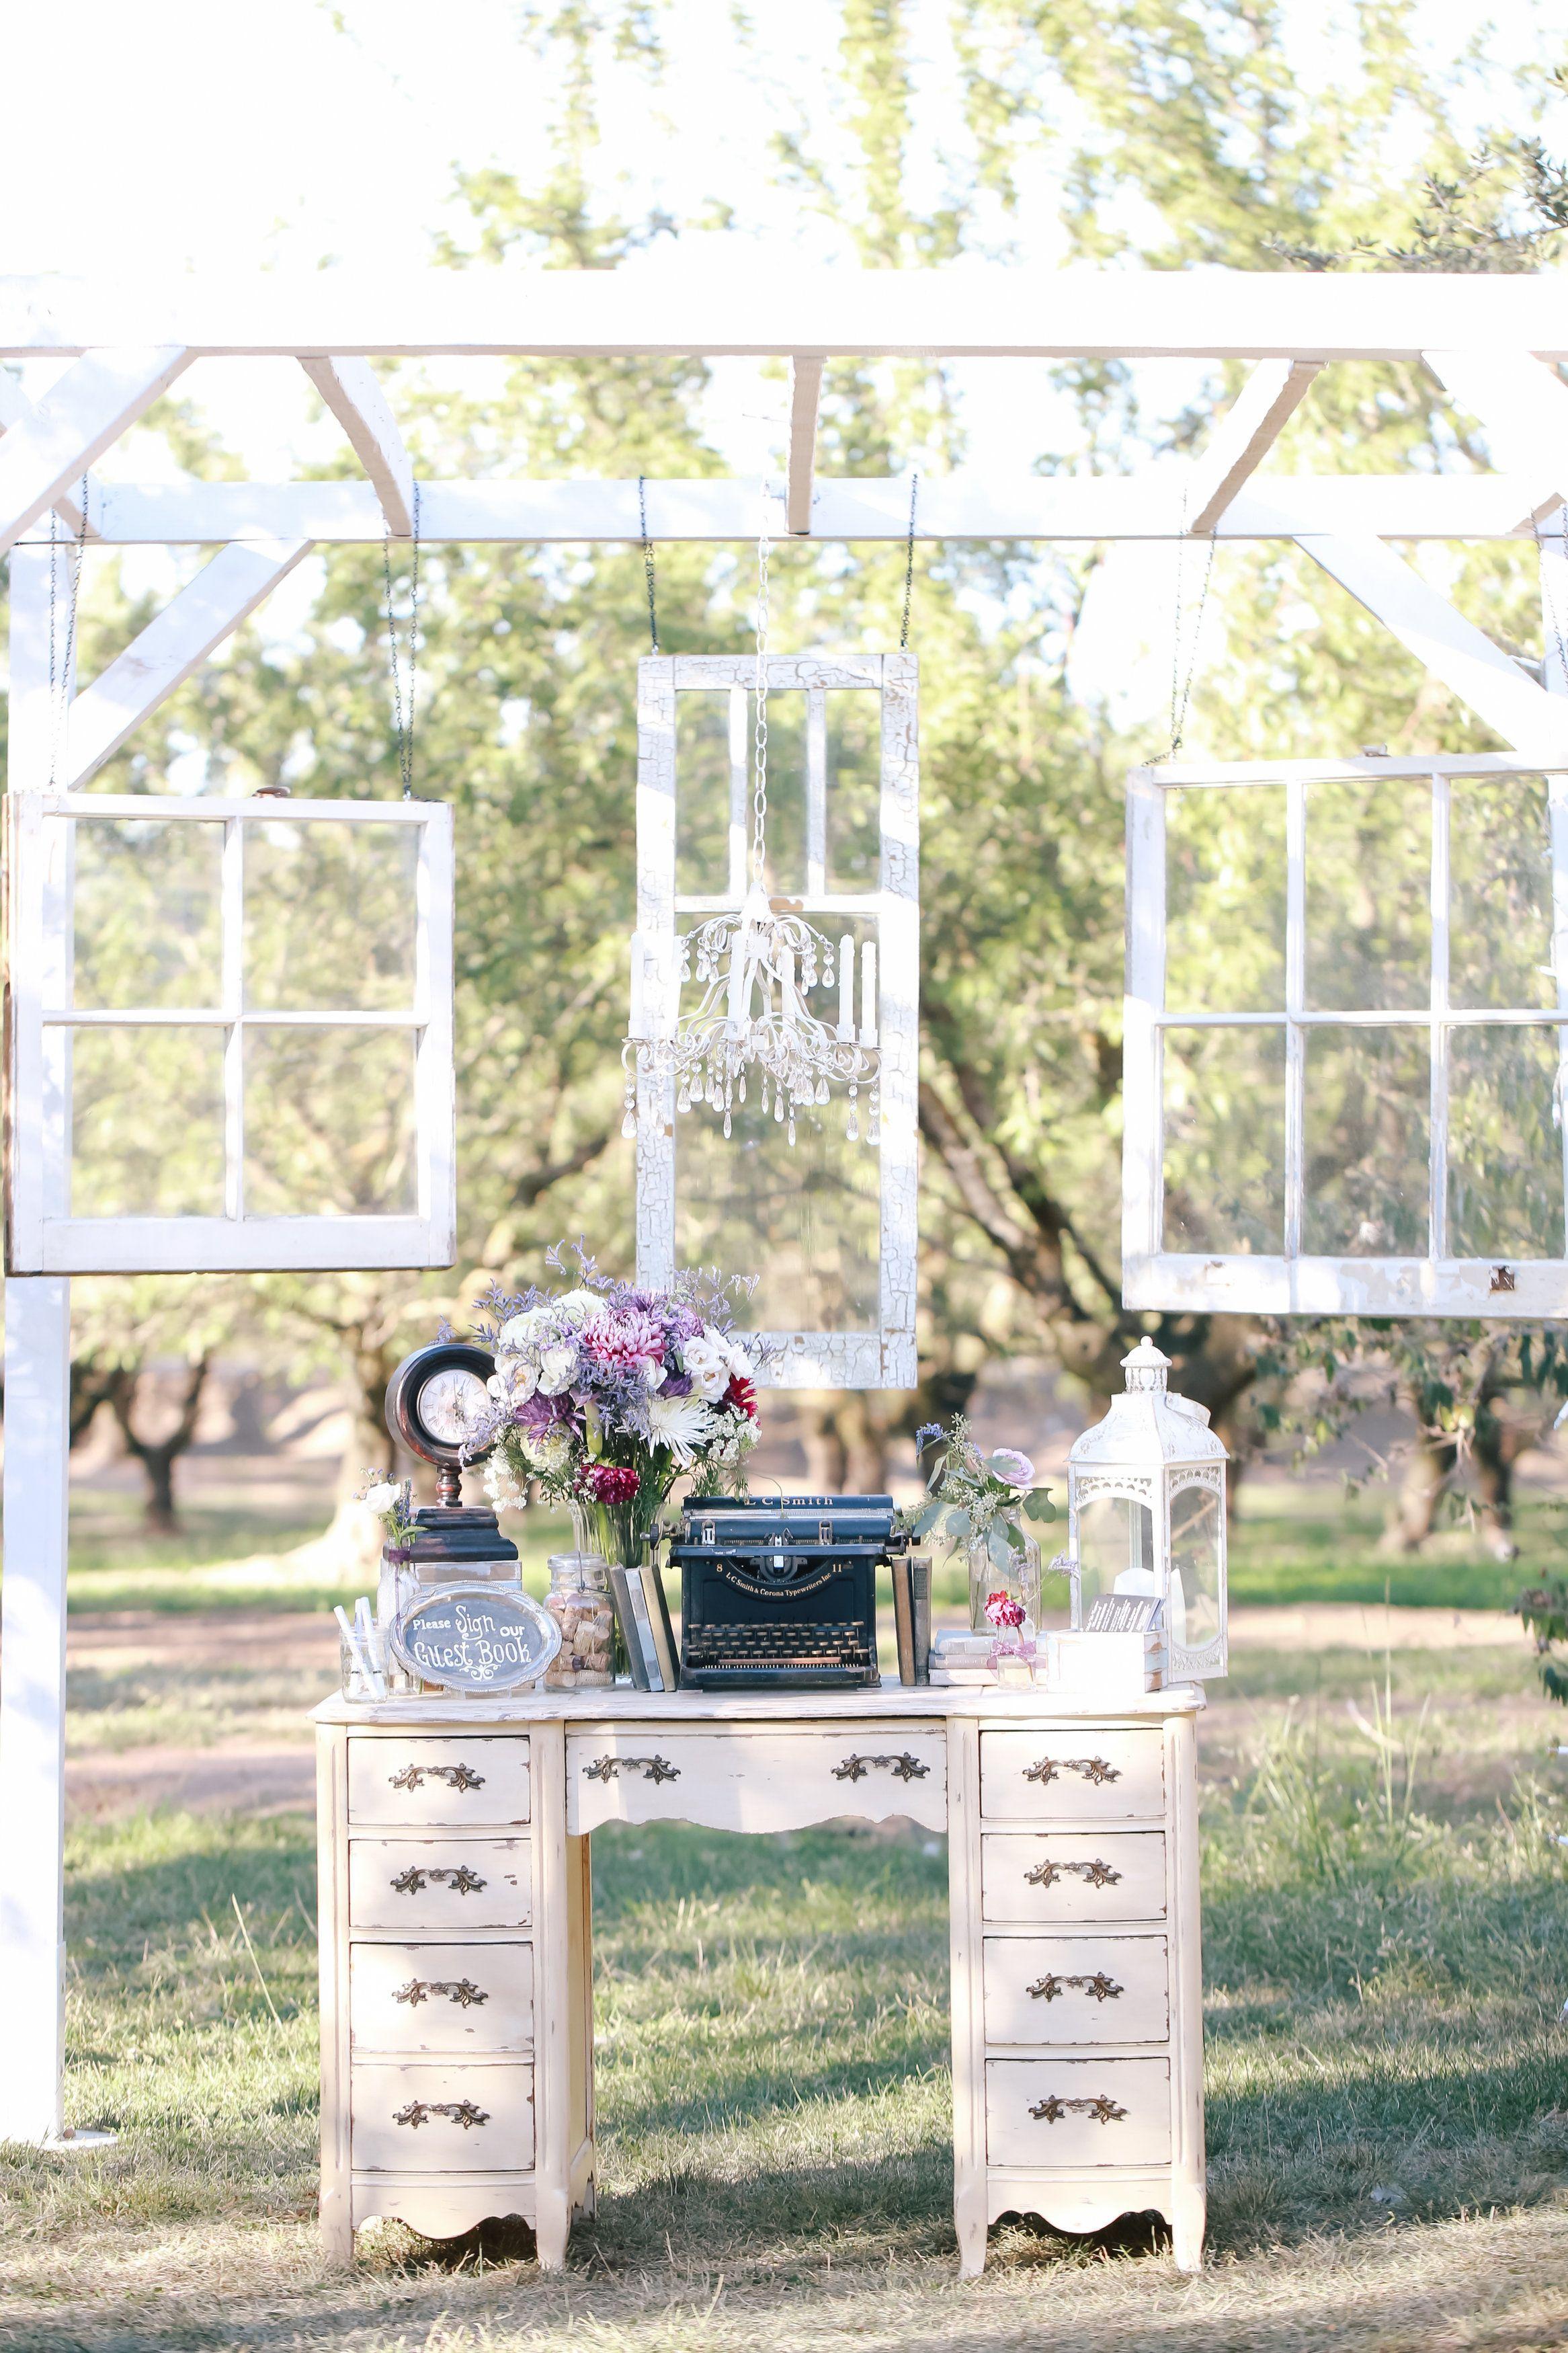 Vintage Wedding Decor Guest Sign In Area Windows Desk Typewriter Cha Vintage Wedding Centerpieces Vintage Wedding Decorations Vintage Wedding Rentals